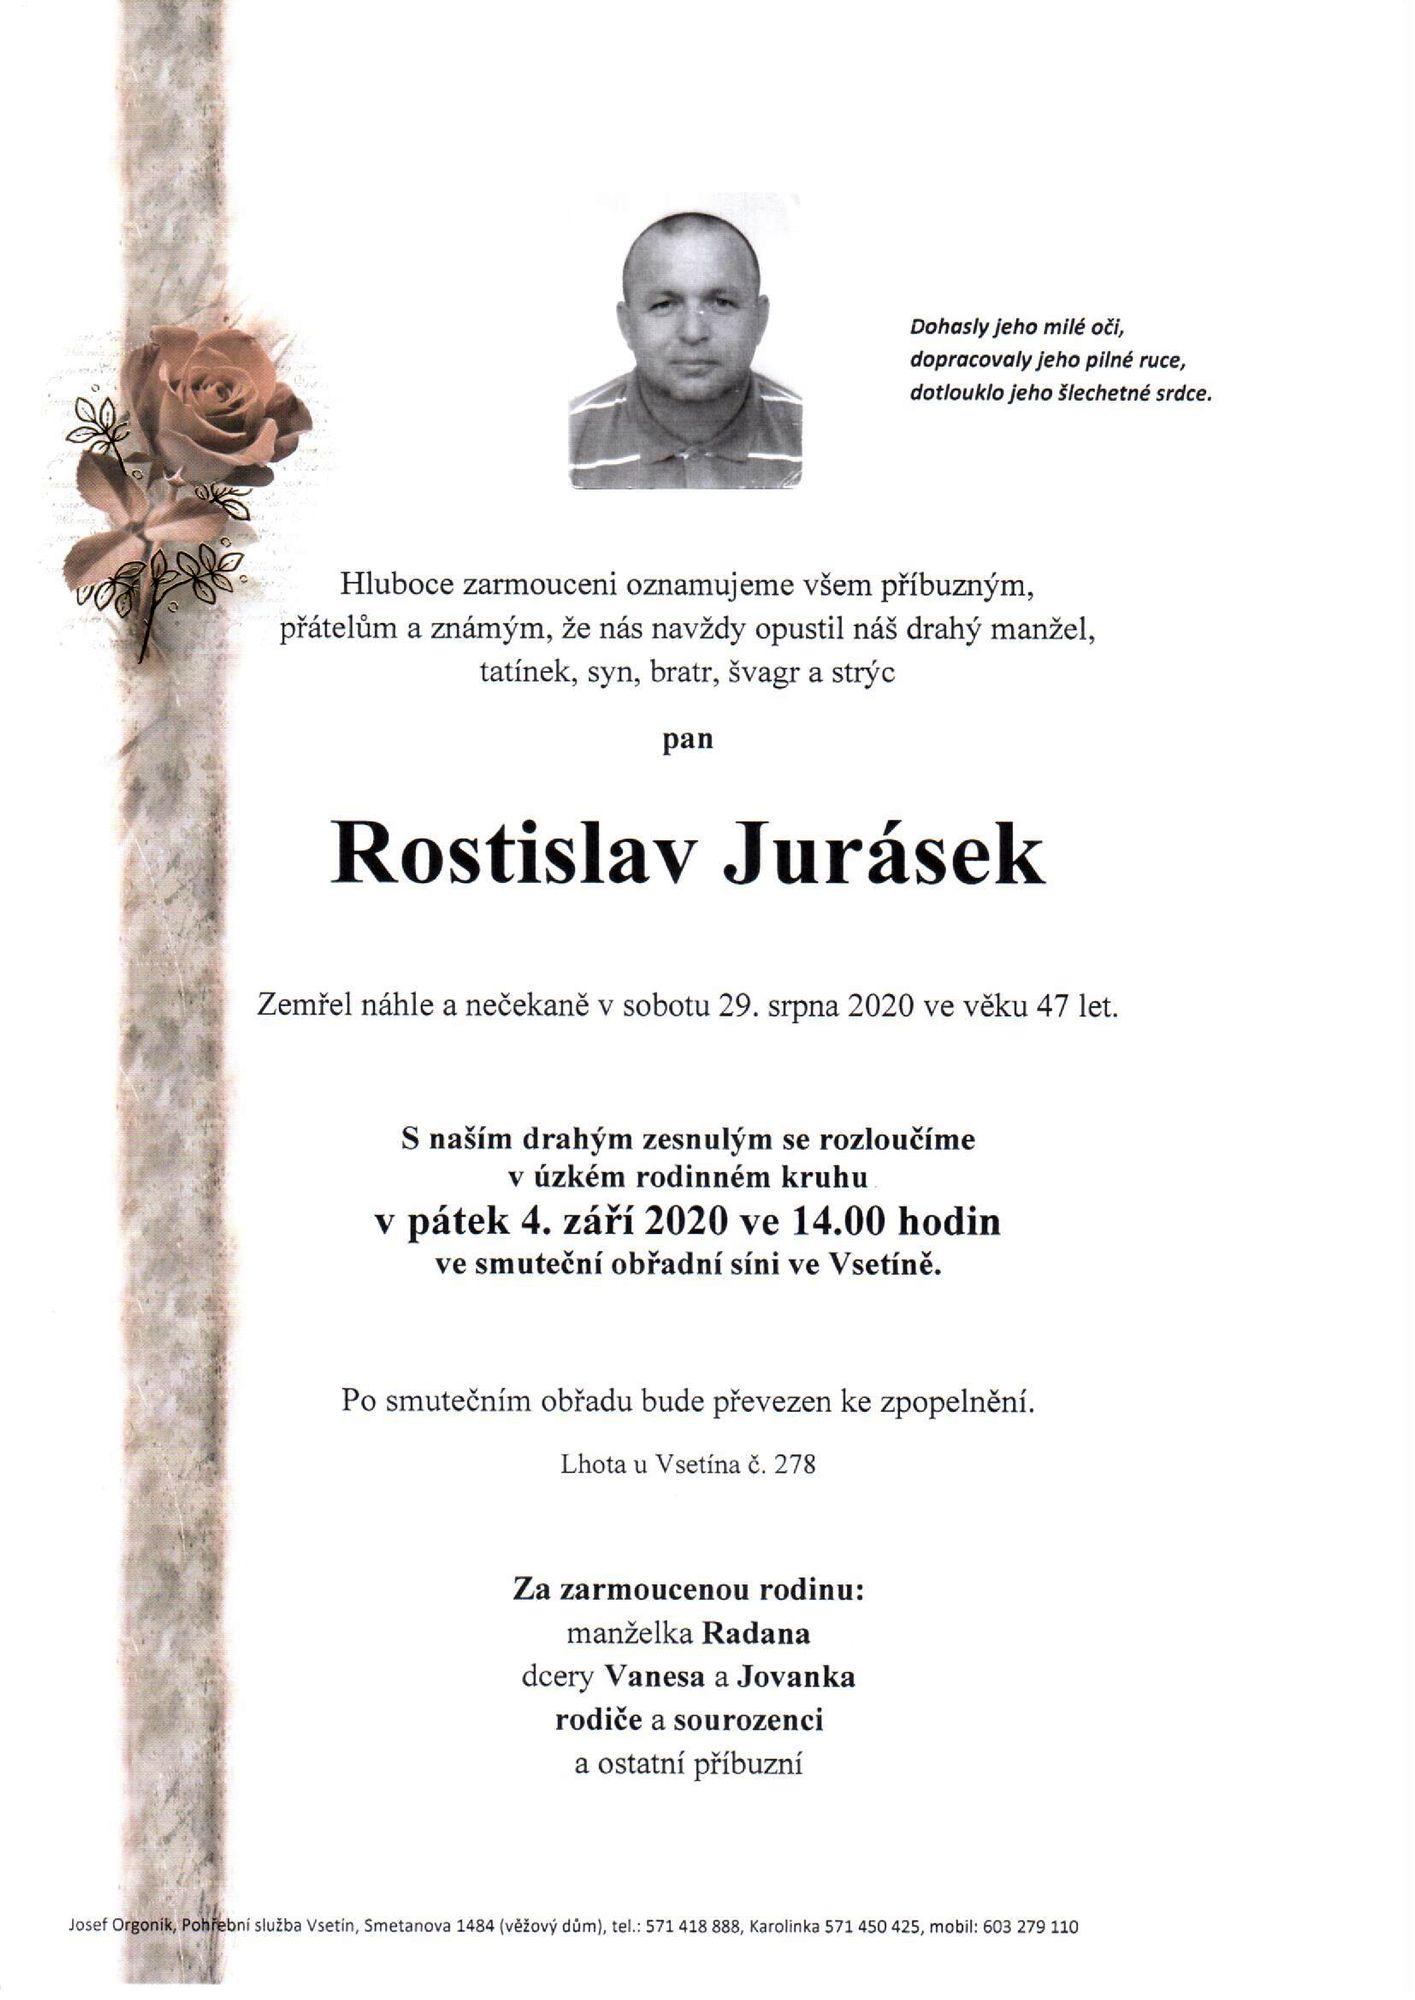 Rostislav Jurásek